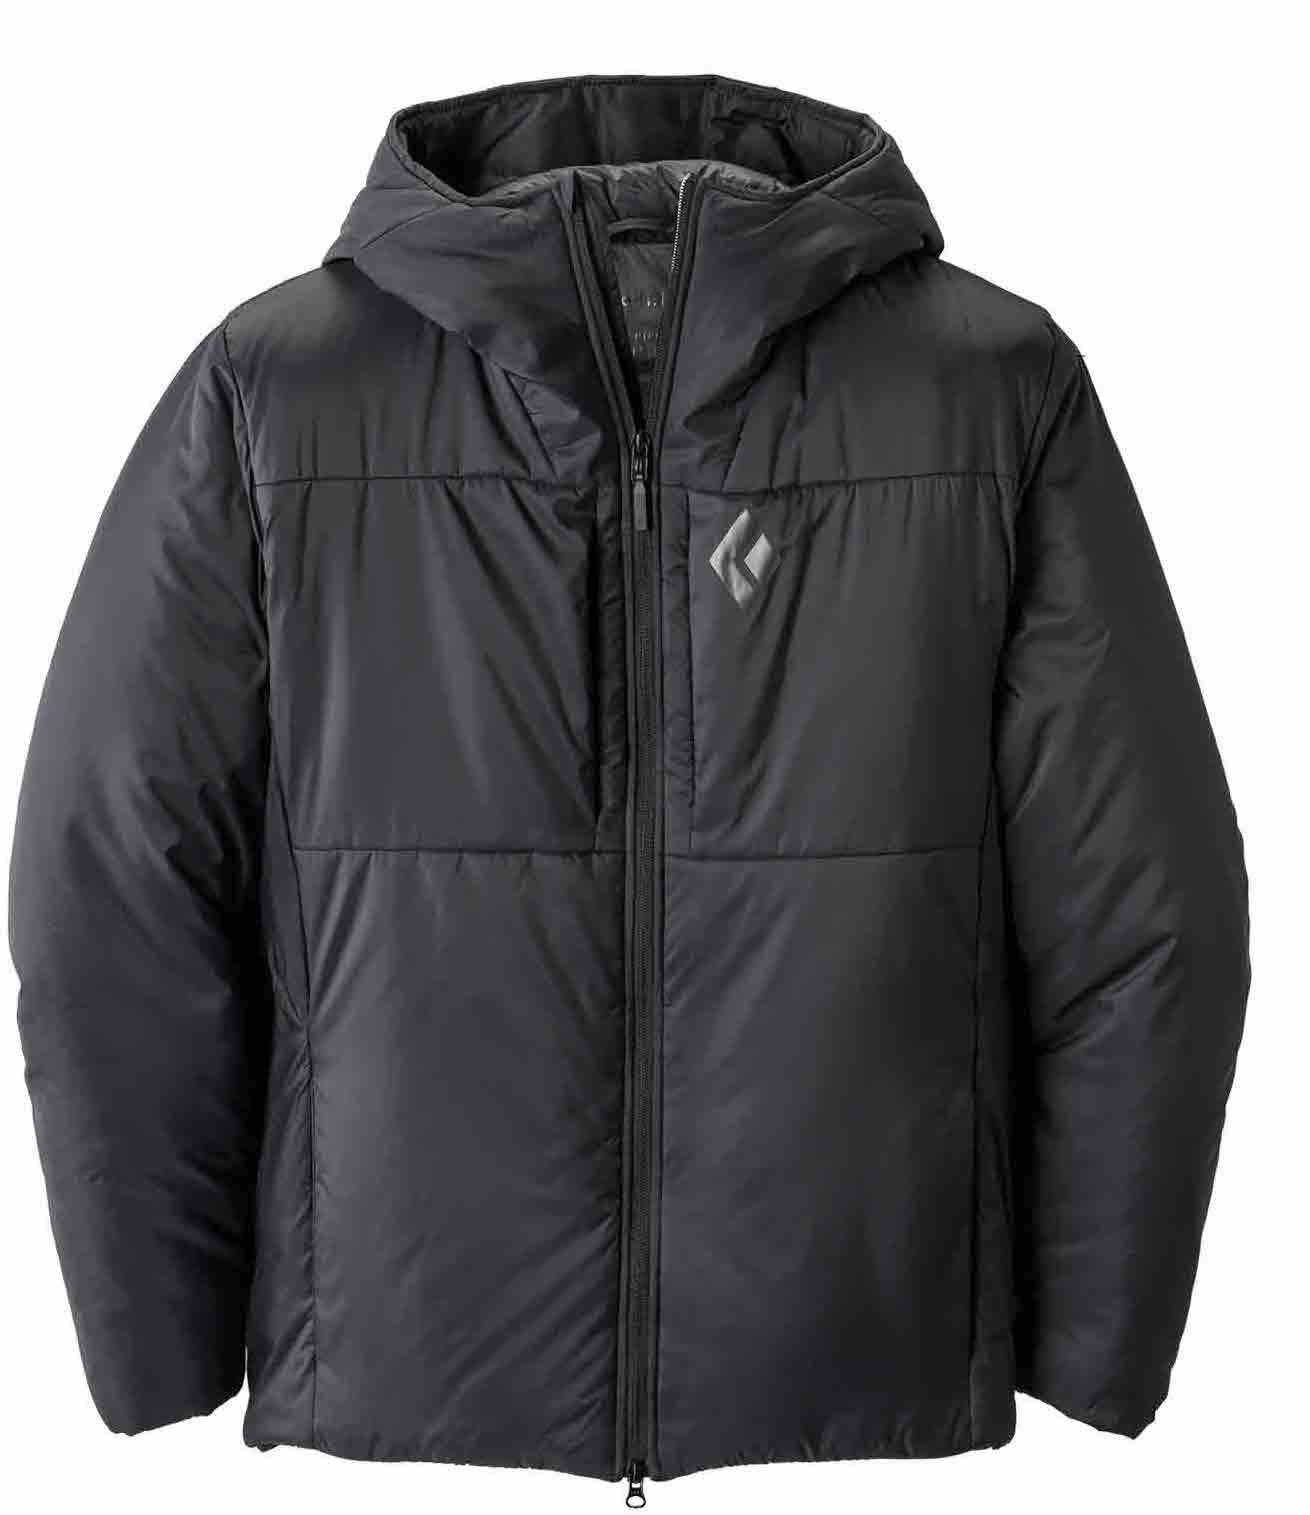 Black Diamond - Stance Belay Parka - Outdoor jacket - Men's